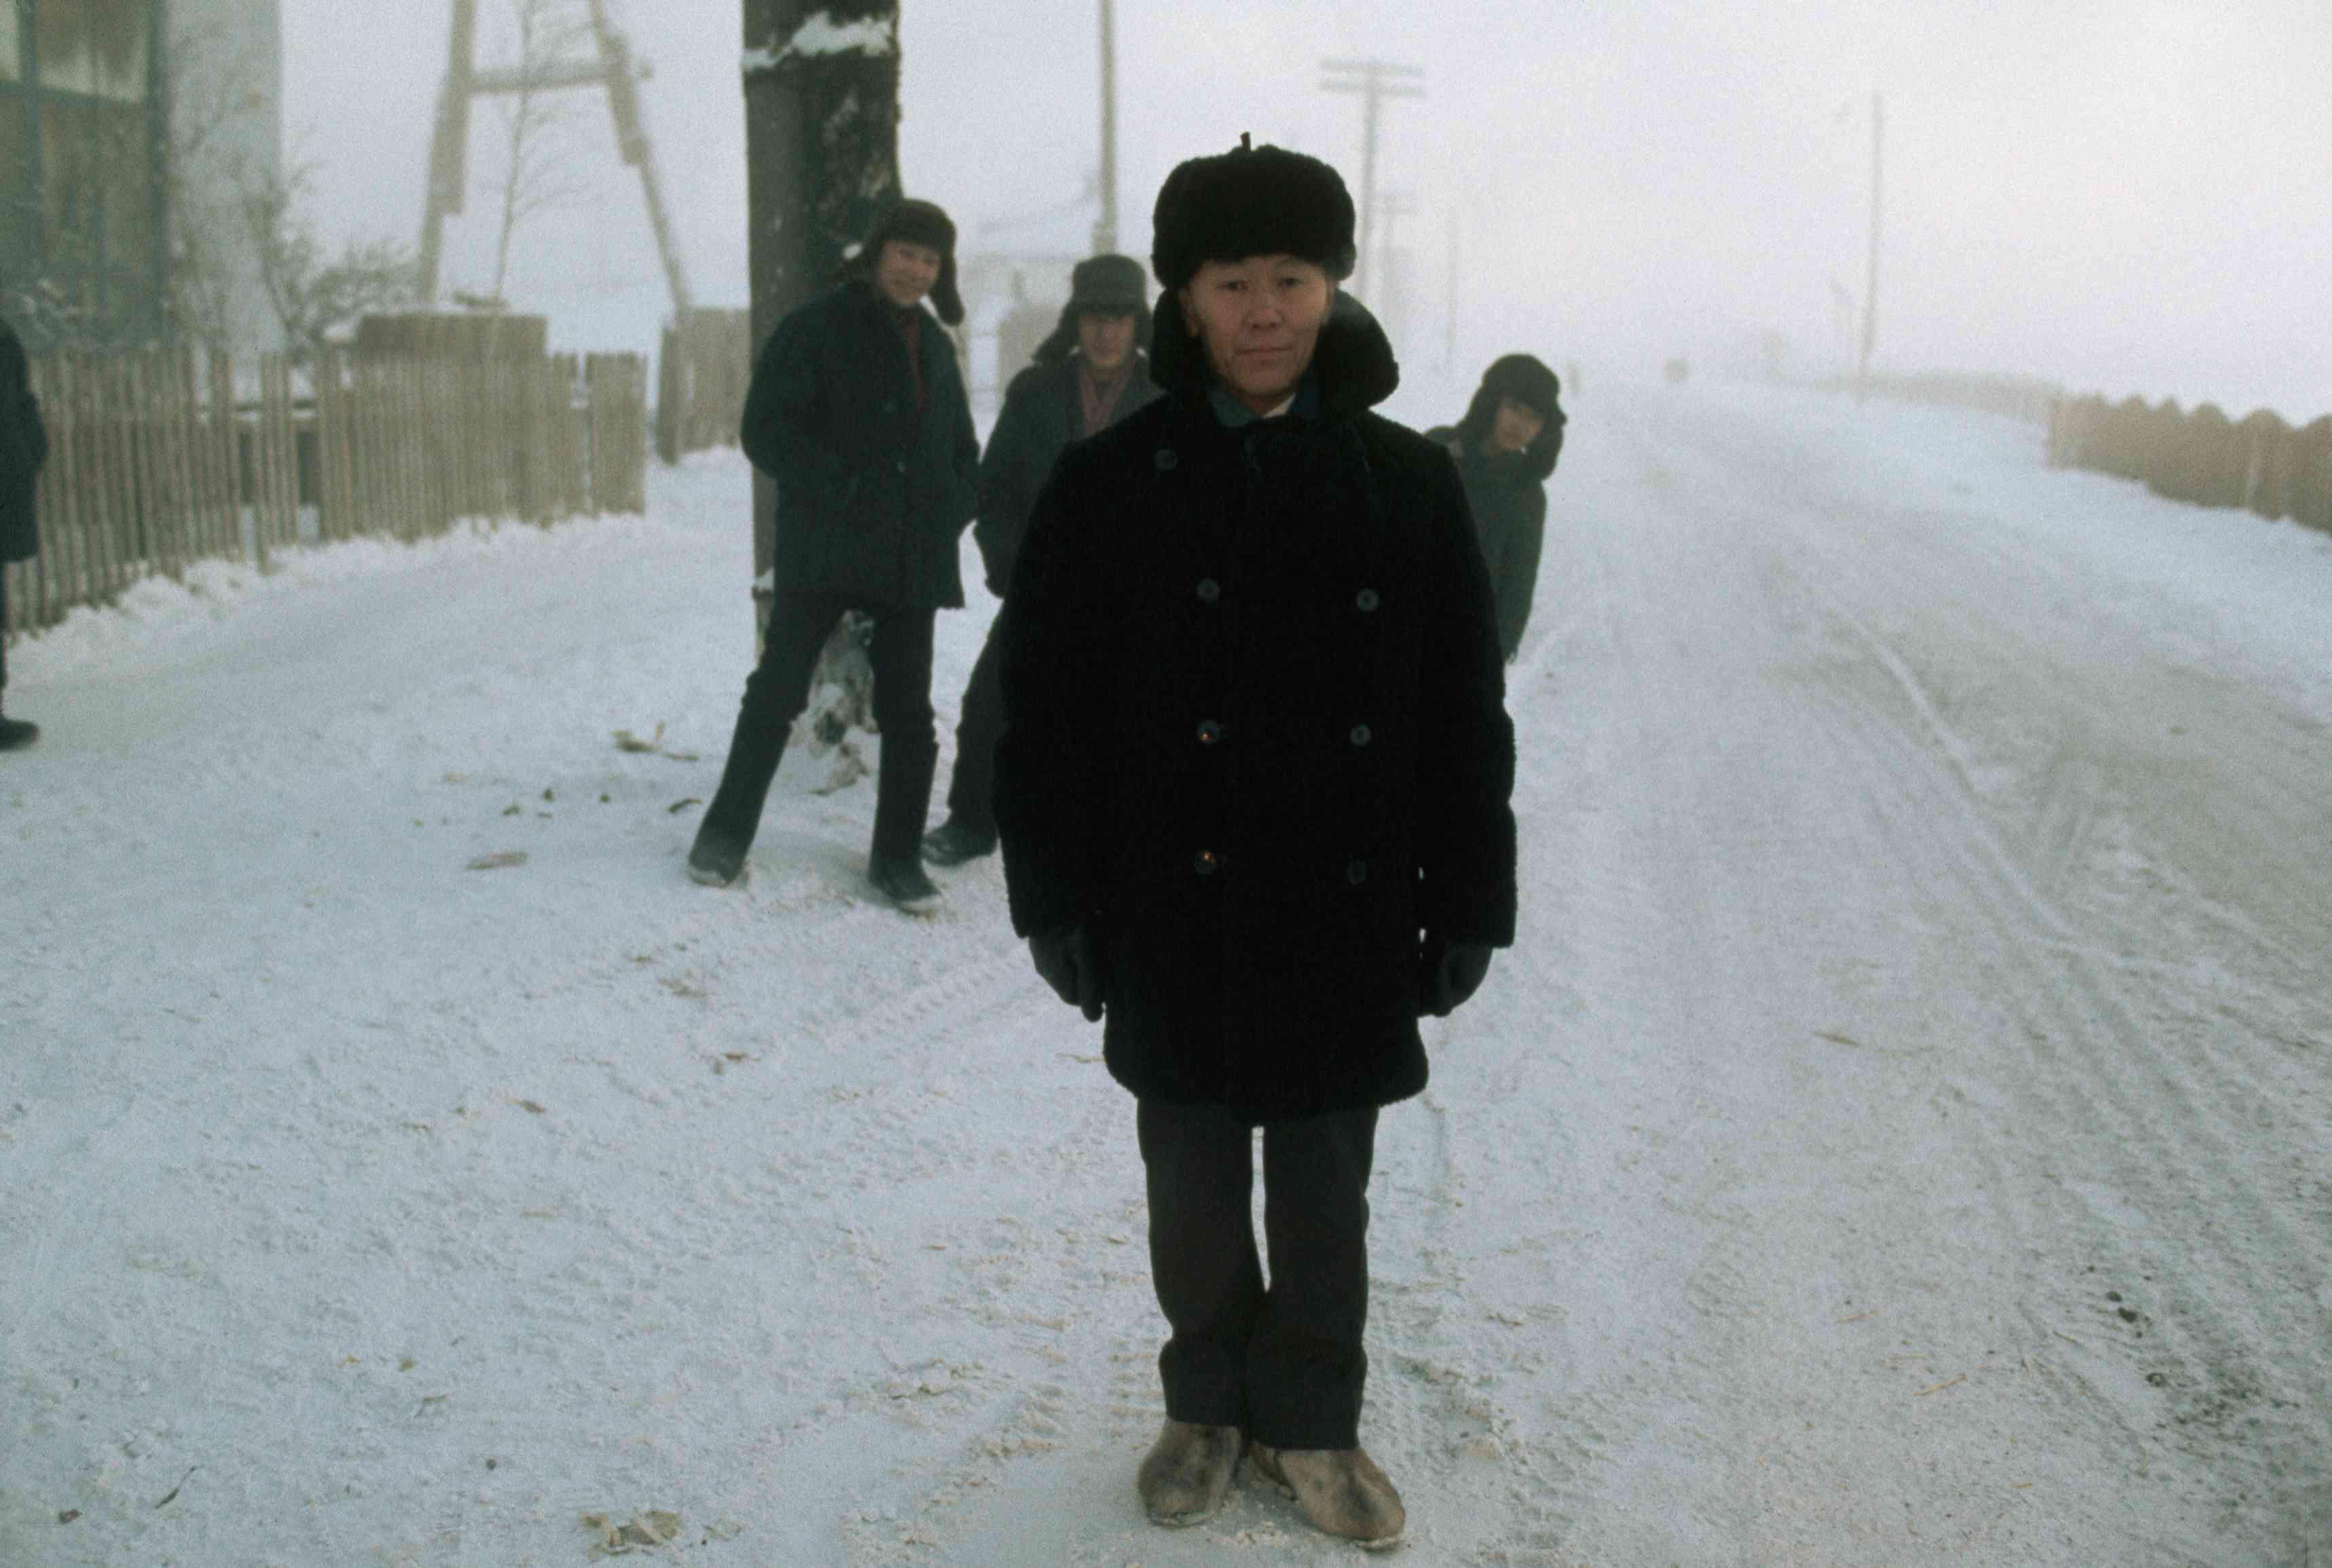 Mayor of Verkhoyansk on a snow-covered street